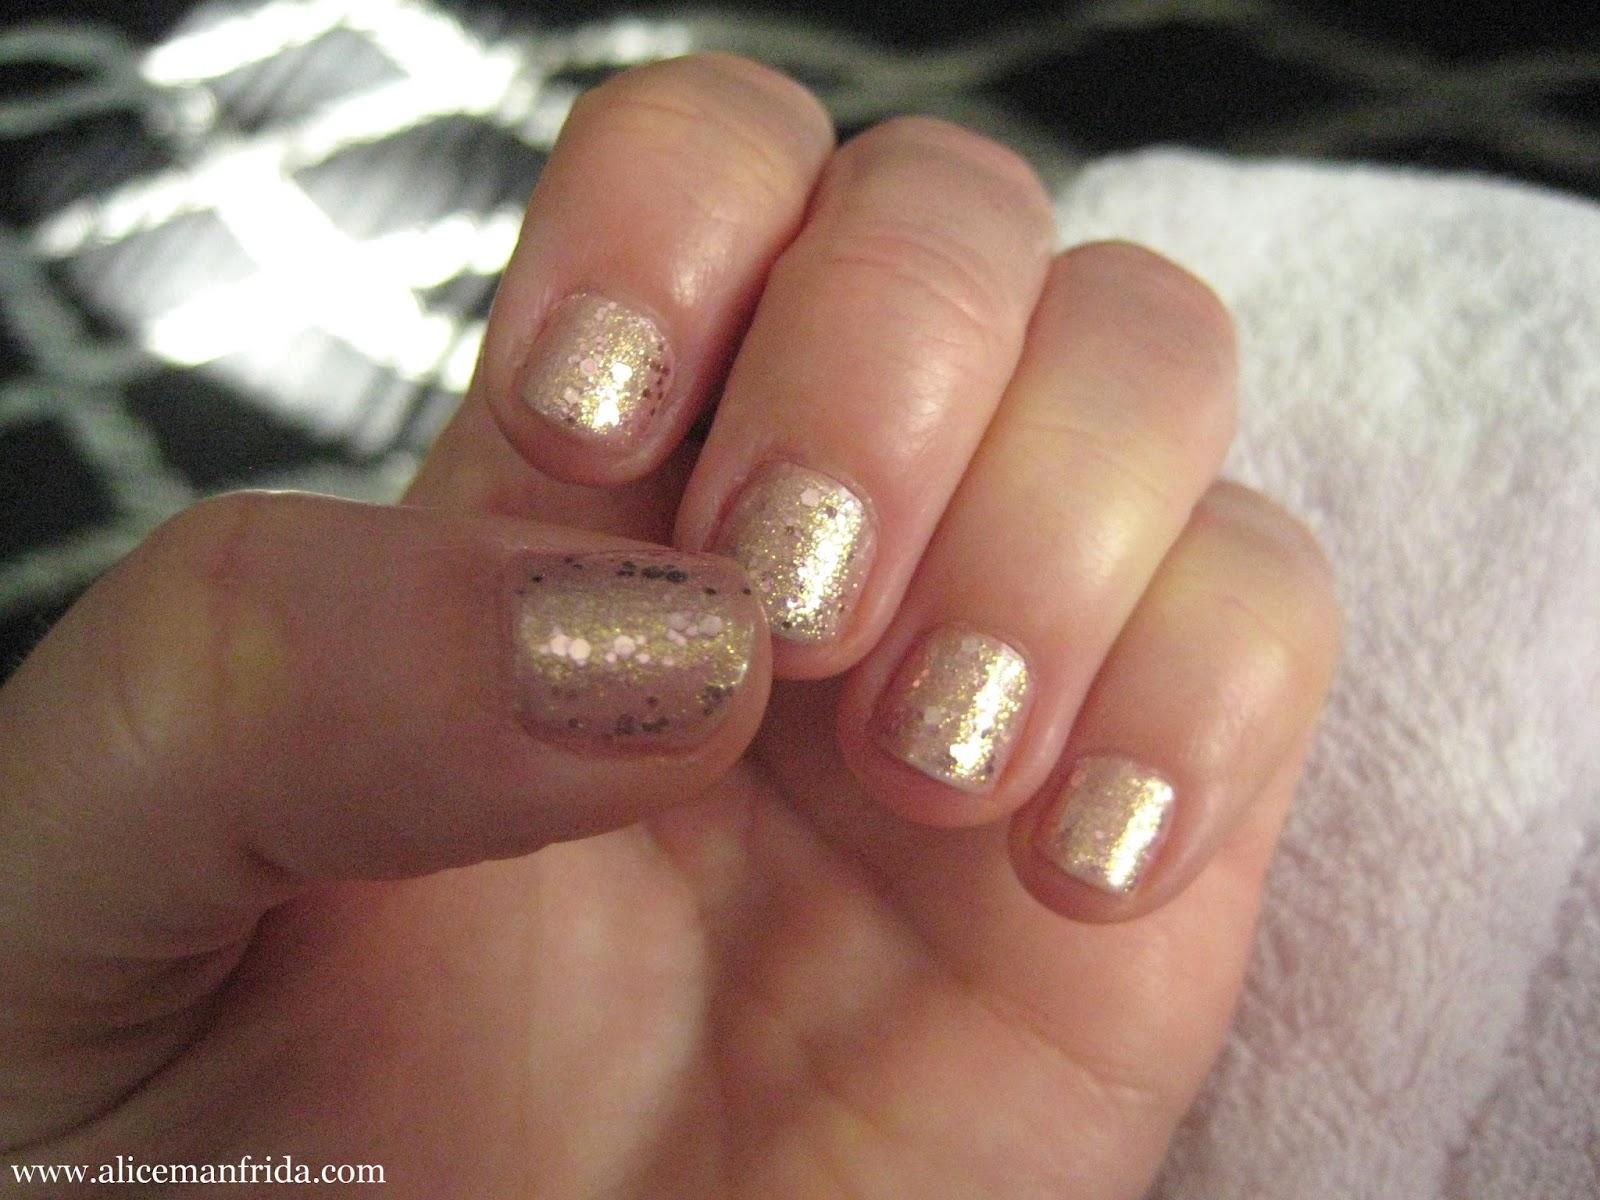 sparkle, rose gold, gold, pink, nails, nail polish, manicure, Milani,deborah lippmann